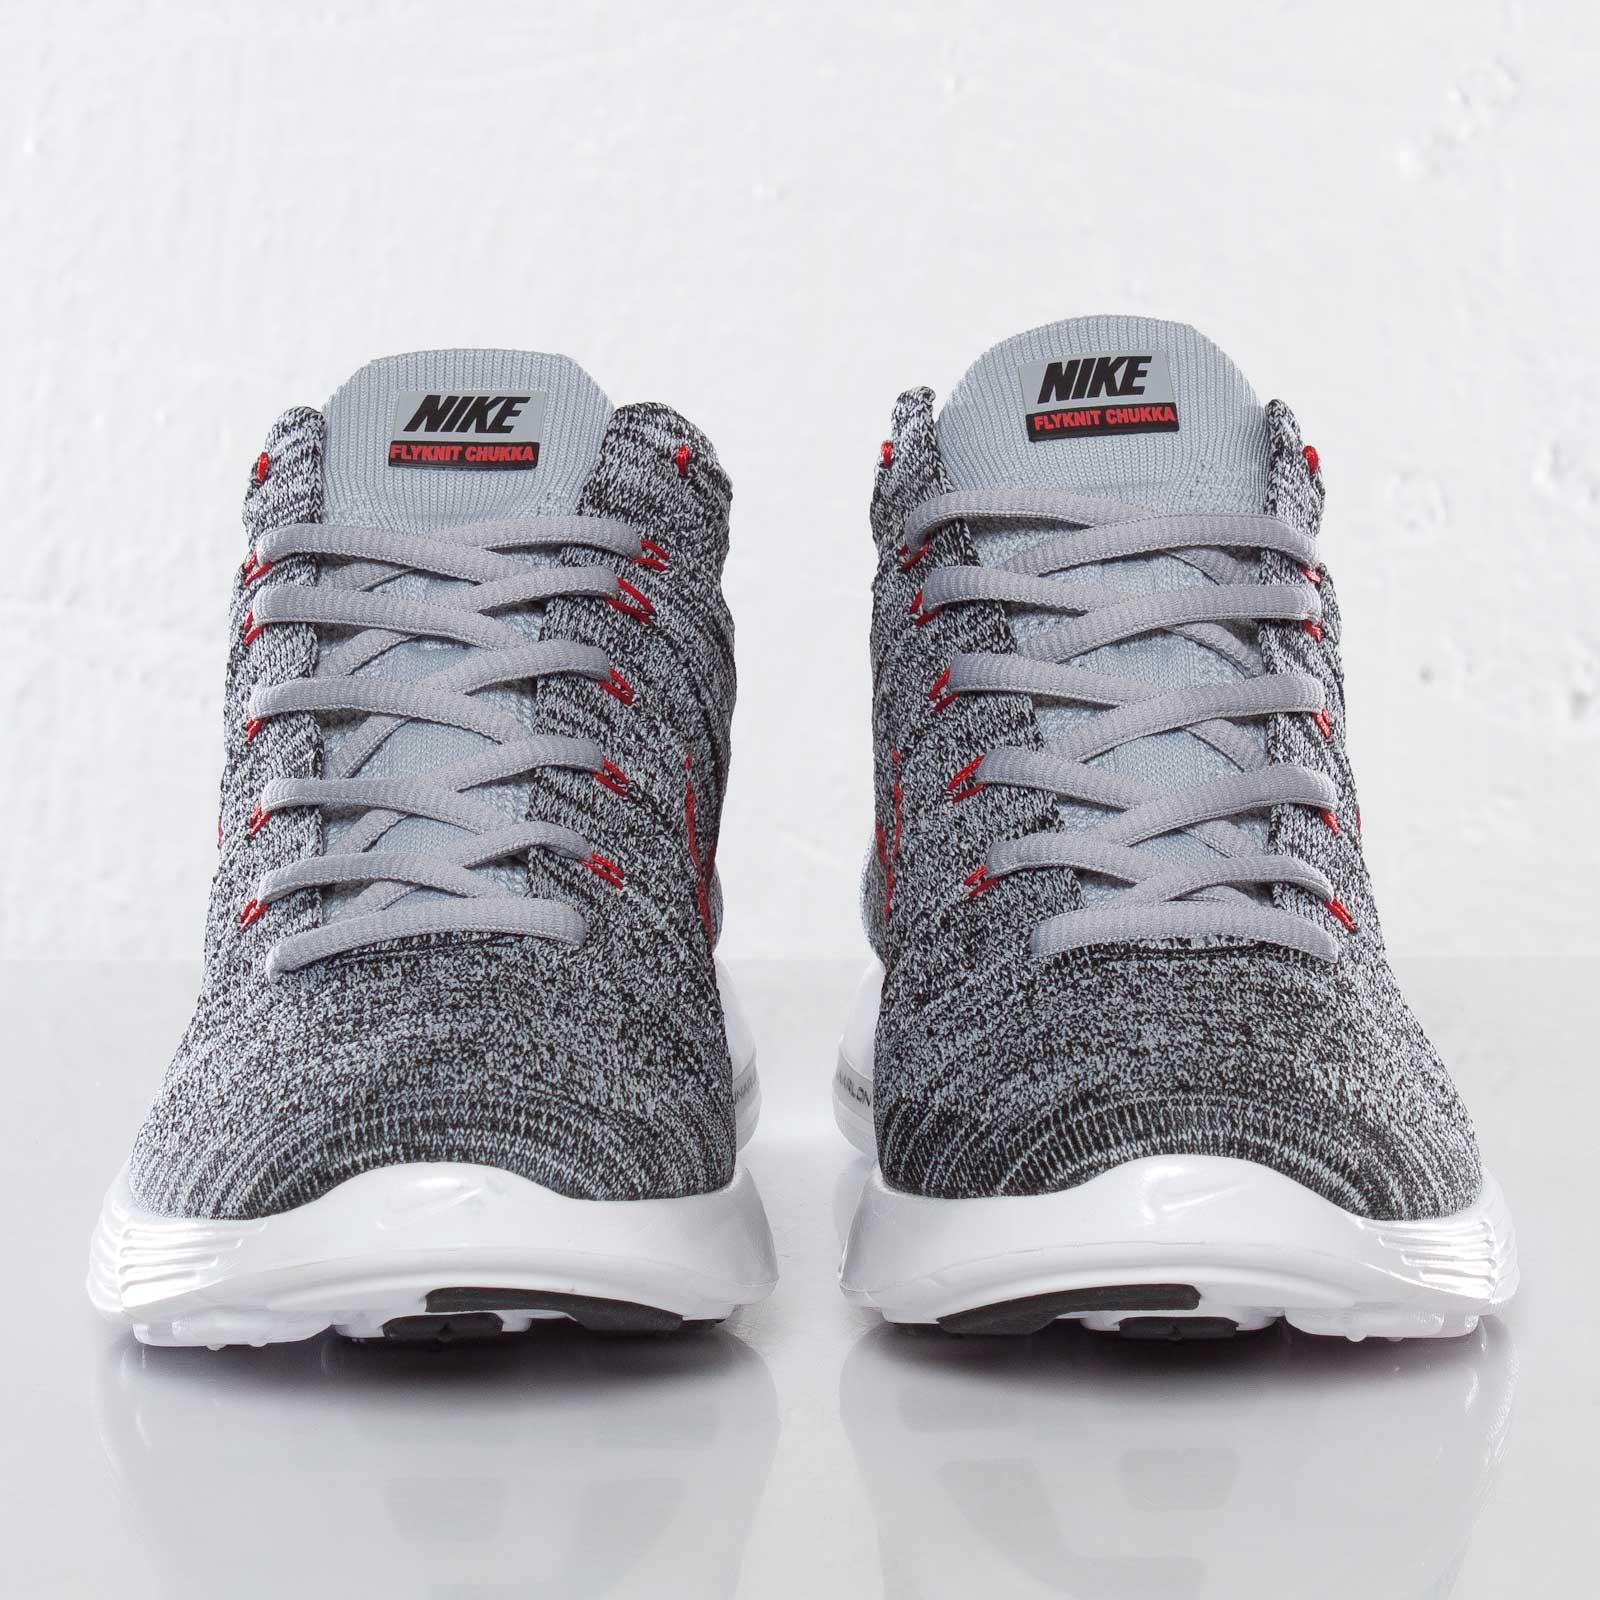 4290bbcdef Nike Lunar Flyknit Chukka - 554969-001 - Sneakersnstuff